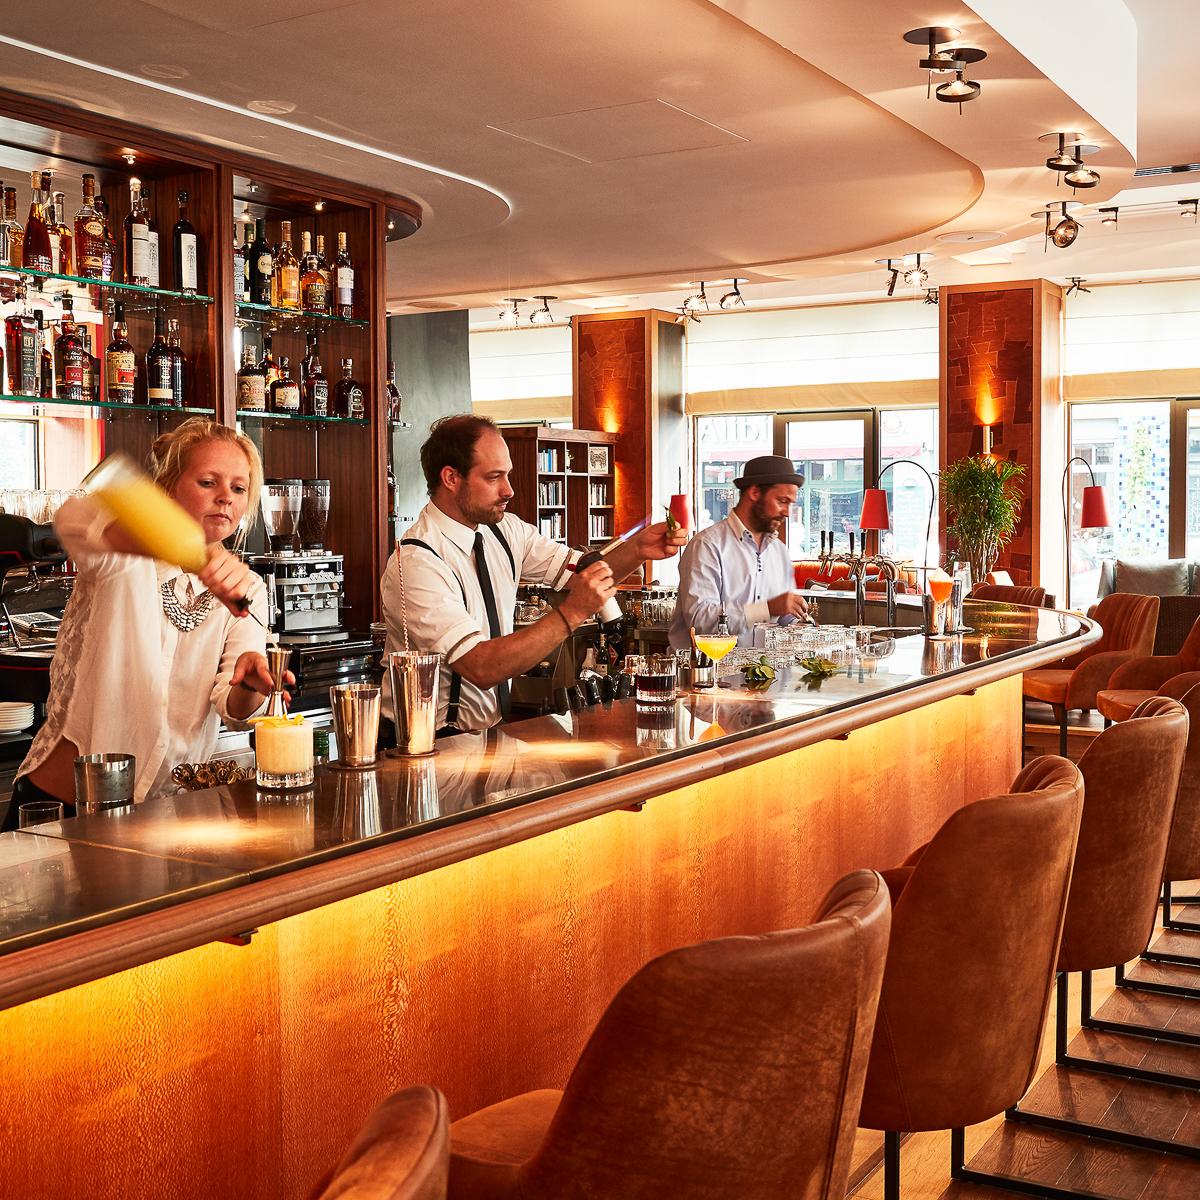 Hotel Restaurant Bar Orania Berlin Kreuzberg-4